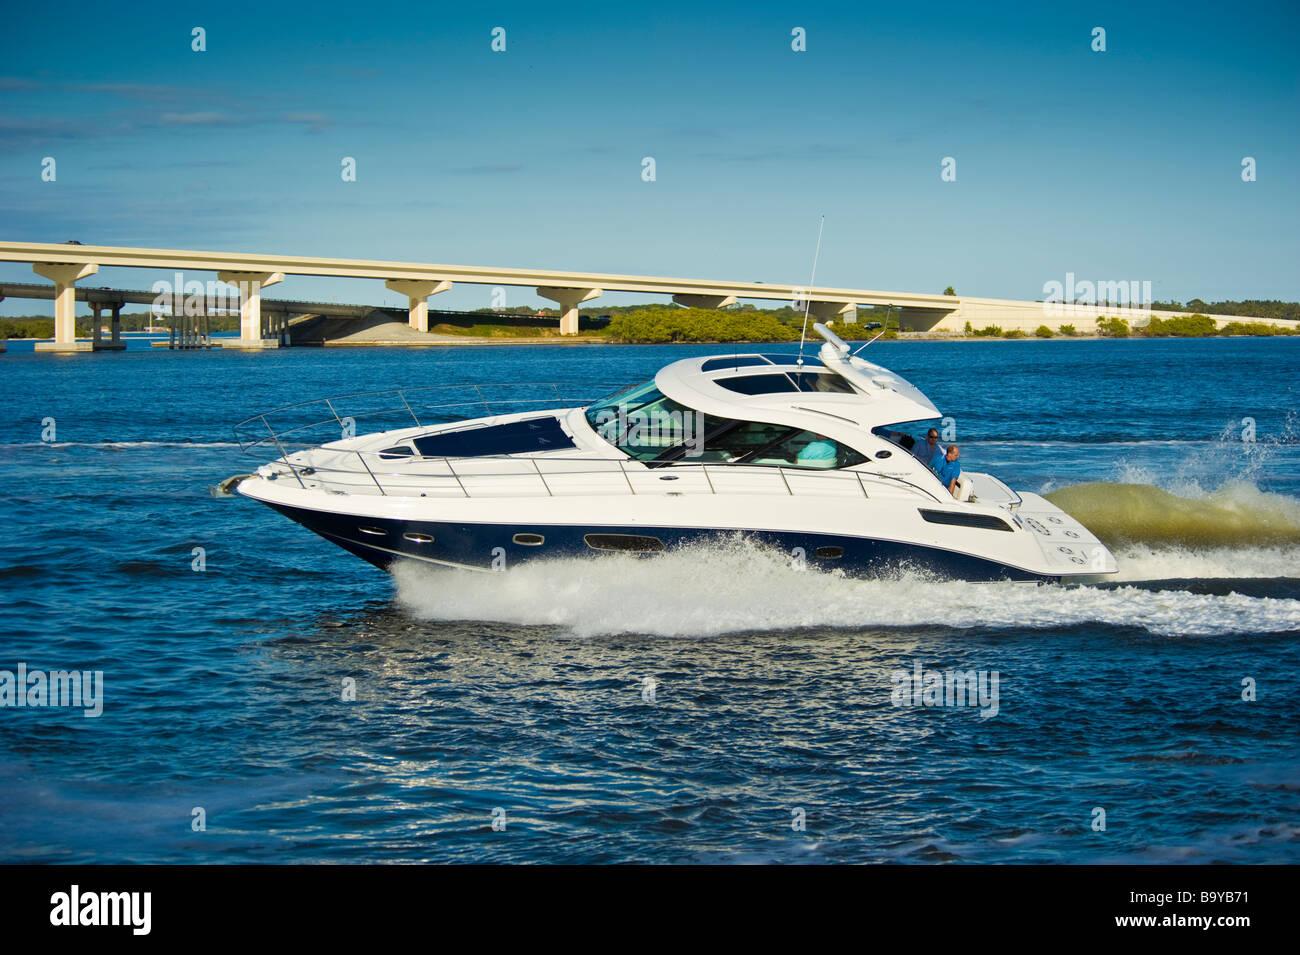 Sea Ray 43 Sundancer powerboat on river in Florida USA Sea Ray 43 Sundancer Motoryacht auf einem Fluss in Florida - Stock Image